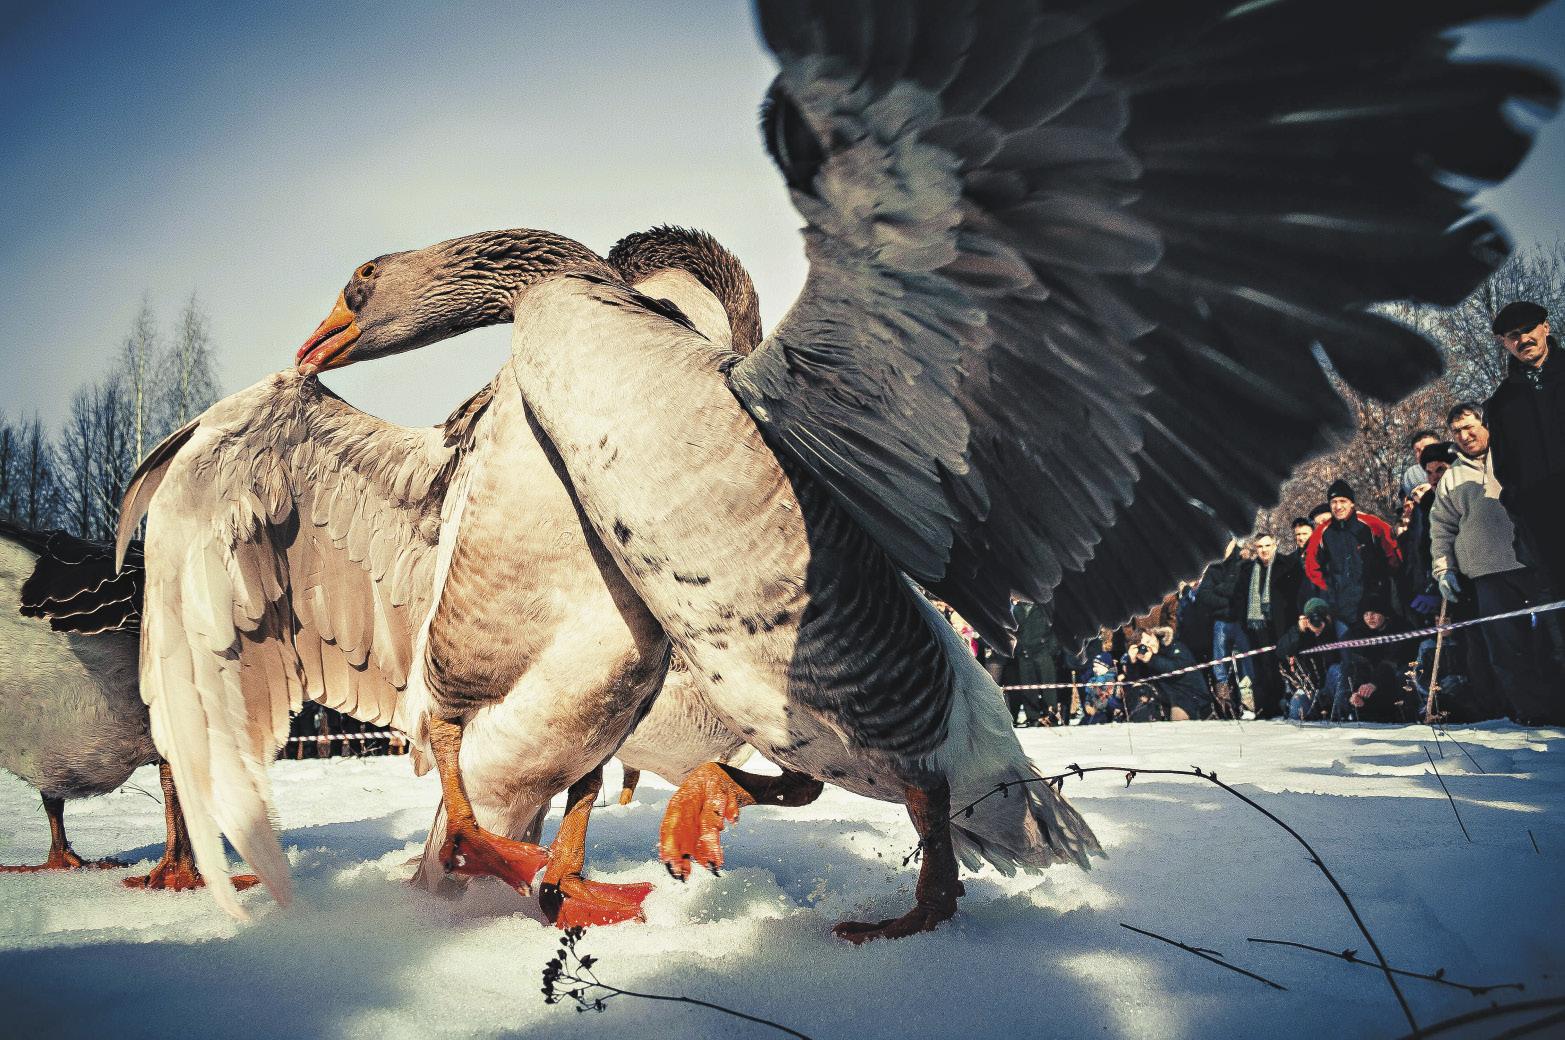 goose_fights_semen_sht_opt